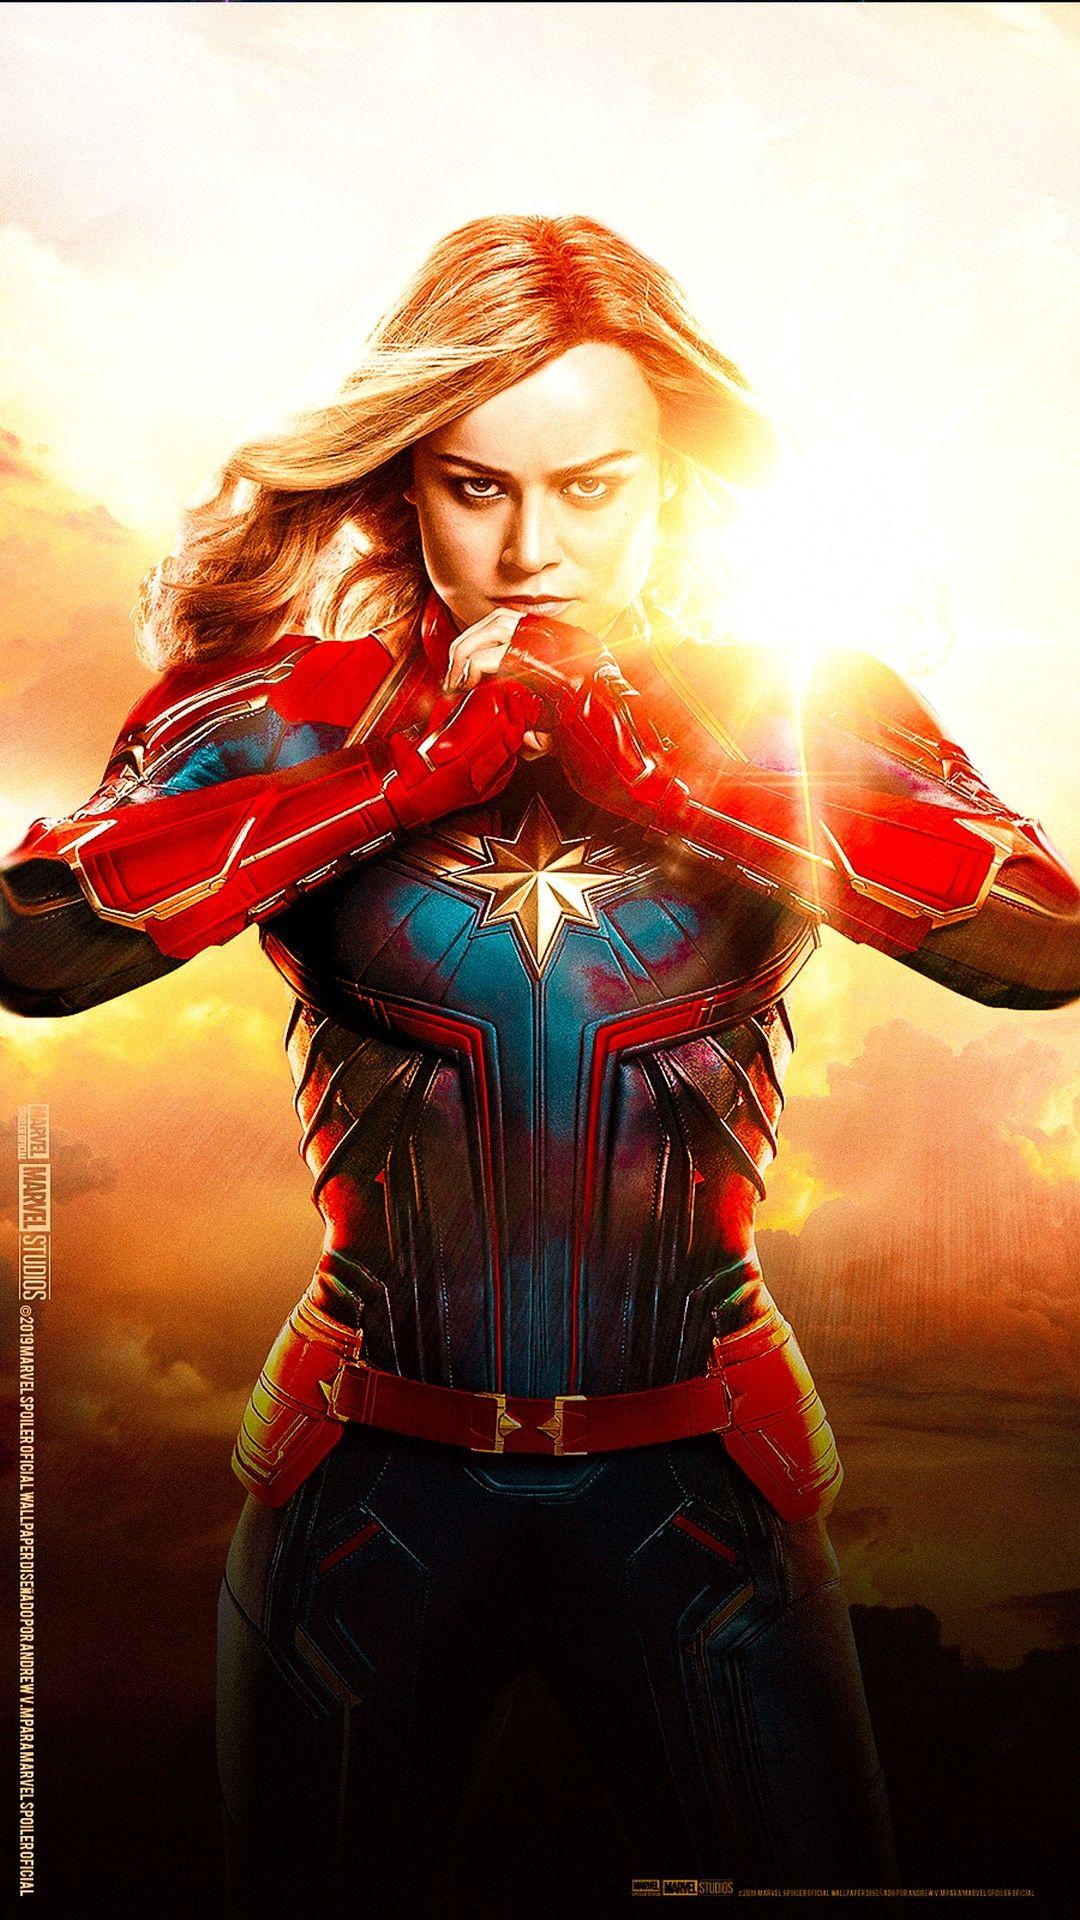 Captain Marvel 2019 Poster Movie Best Movie Poster Wallpaper Hd Captain Marvel Captain Marvel Carol Danvers Marvel Superheroes